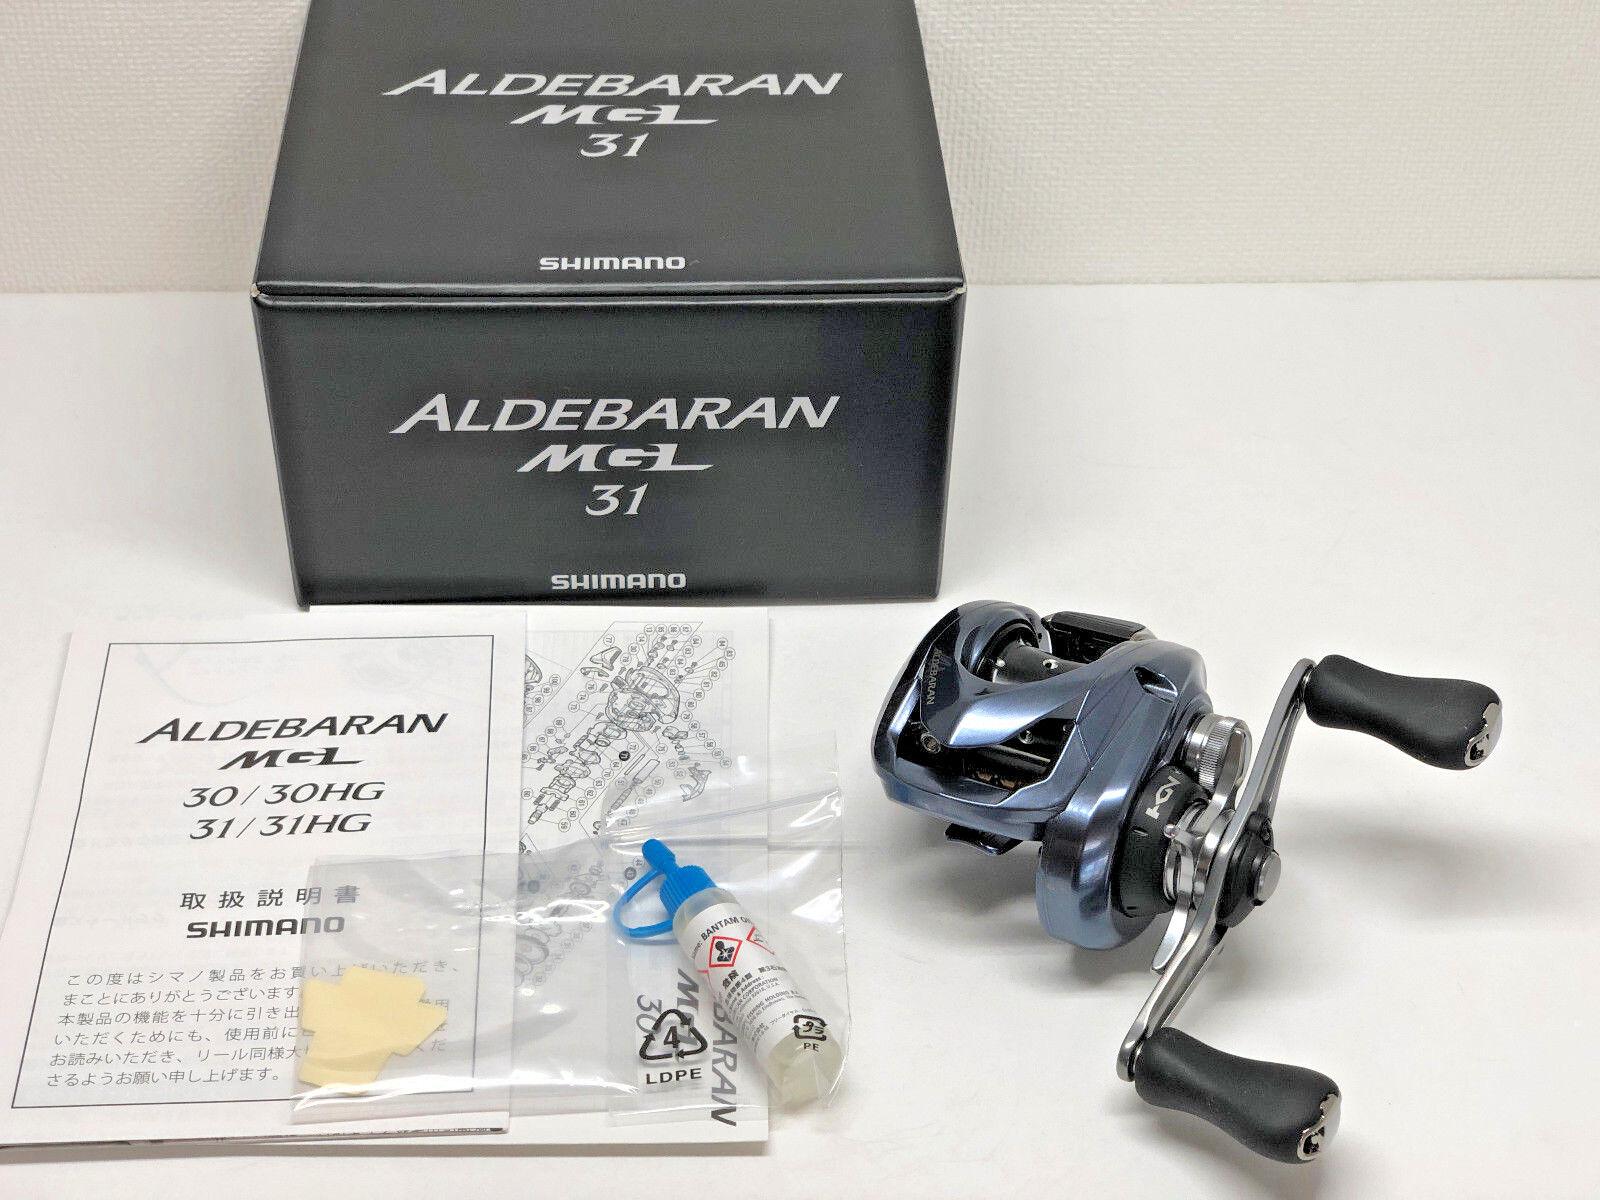 SHIMANO 18 ALDEBARAN MGL 31 LEFT  - Free Shipping from Japan